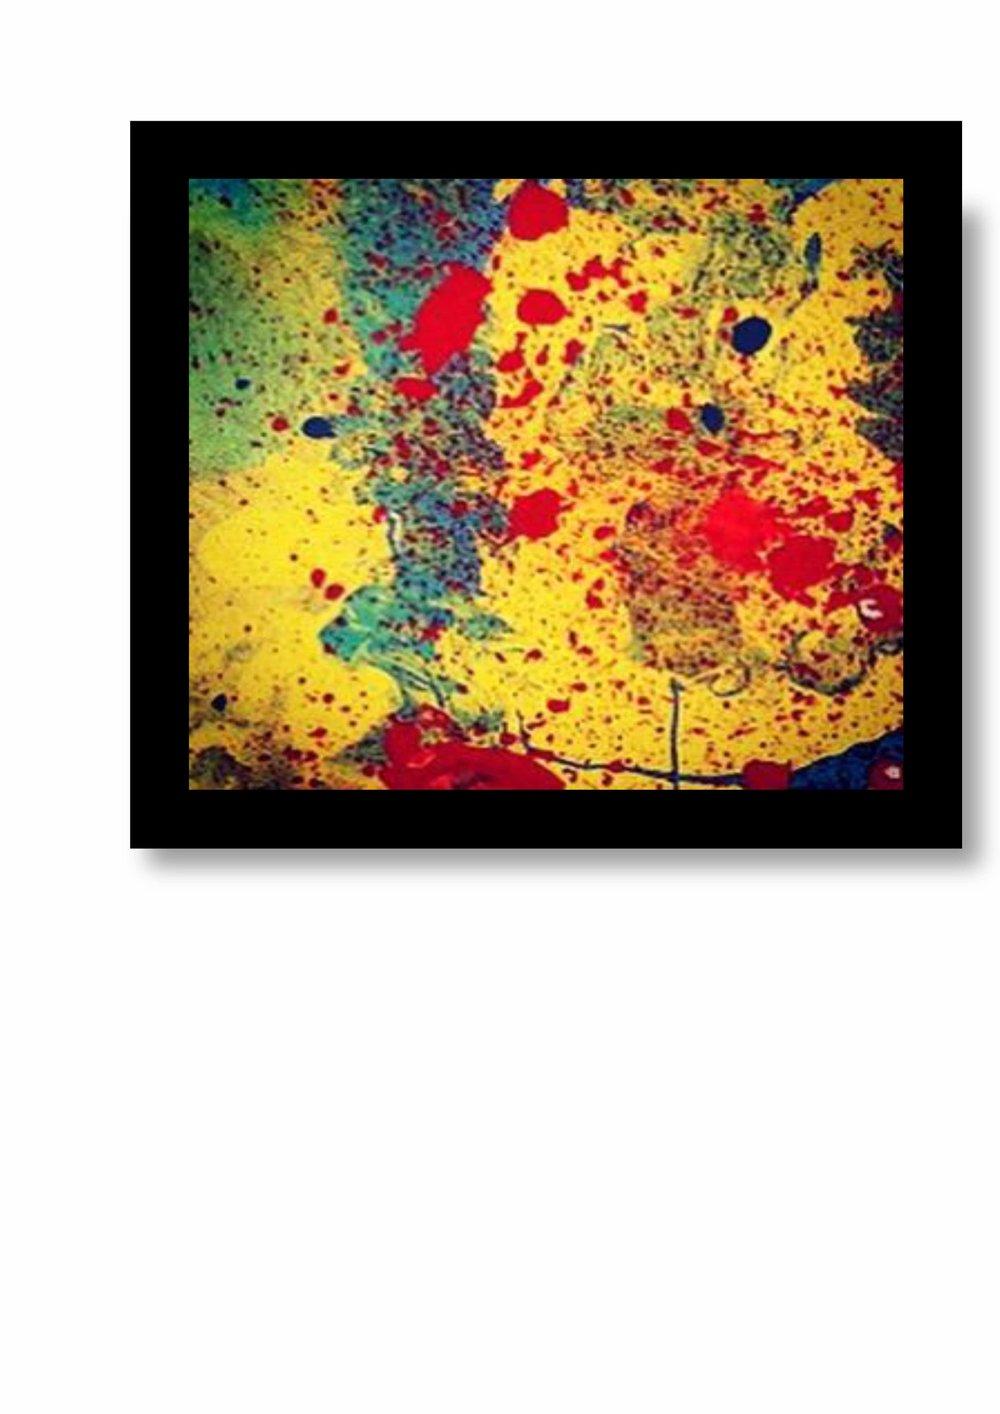 art-portfolio-aglae-corrected-12-min.jpg